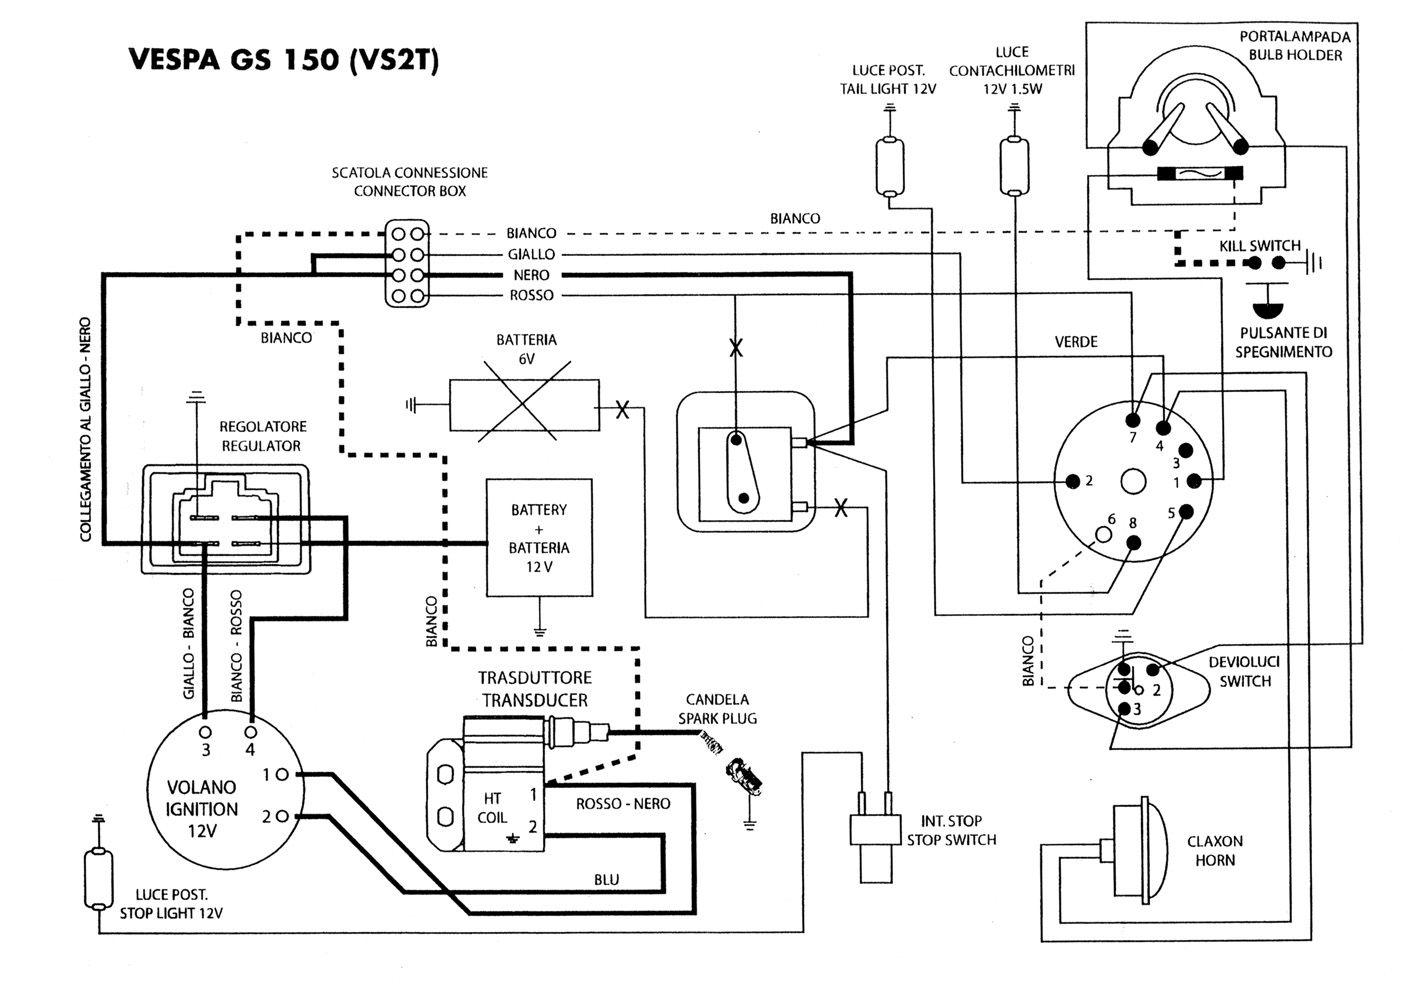 Schaltplan Gs 150 Vs2 7673024 Jpg Jpg 1403 992 Diagram Medias